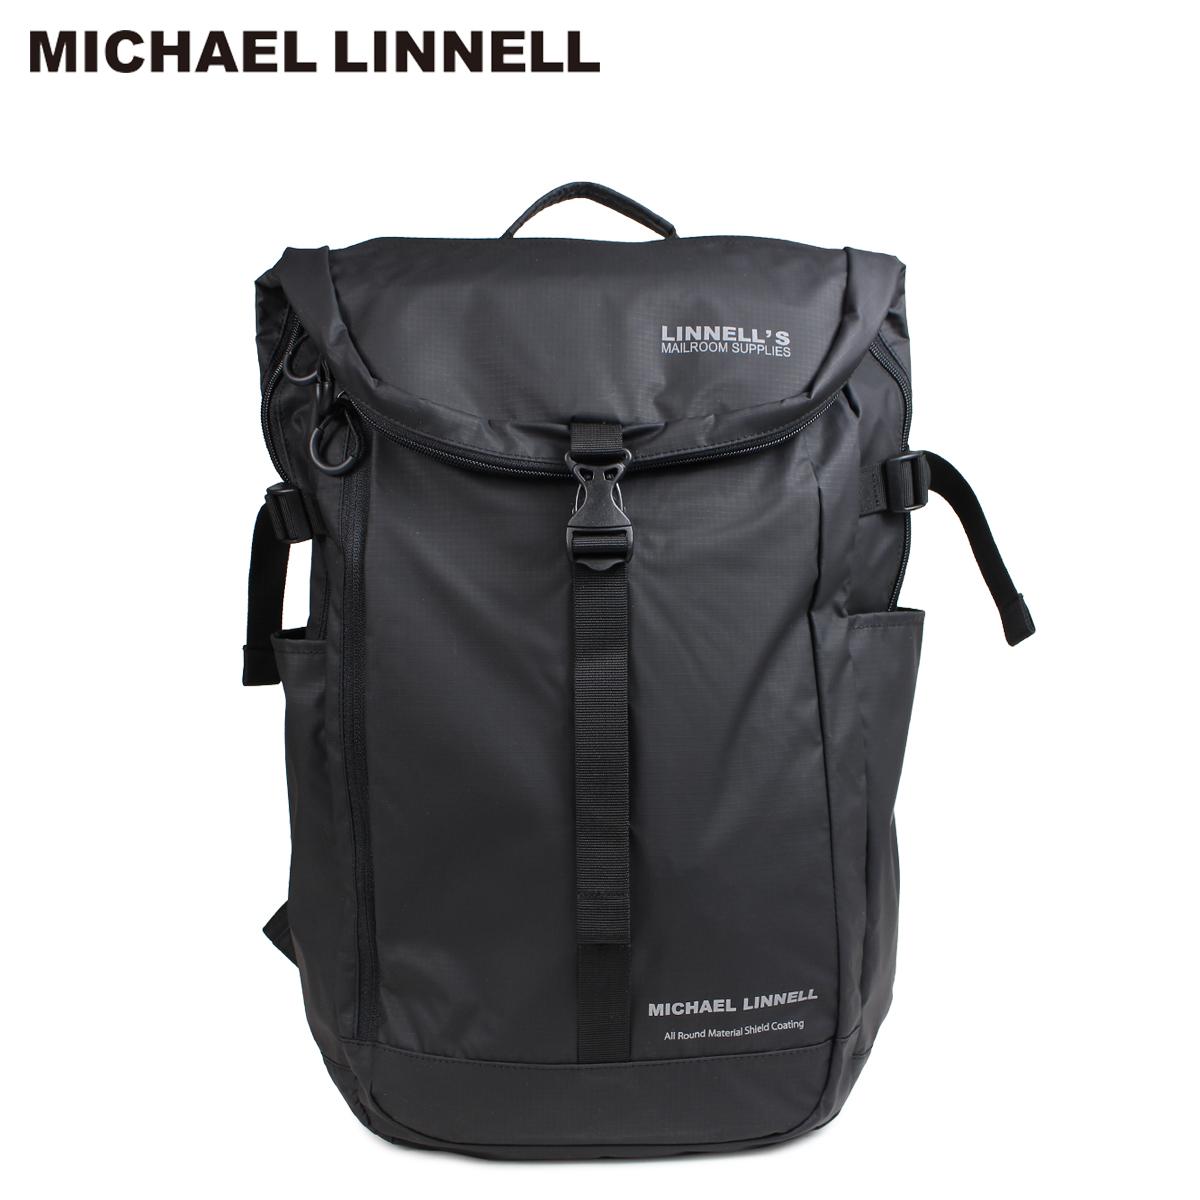 MICHAEL LINNELL BACKPACK マイケルリンネル リュック バッグ 31L メンズ レディース バックパック ブラック MLAC-04